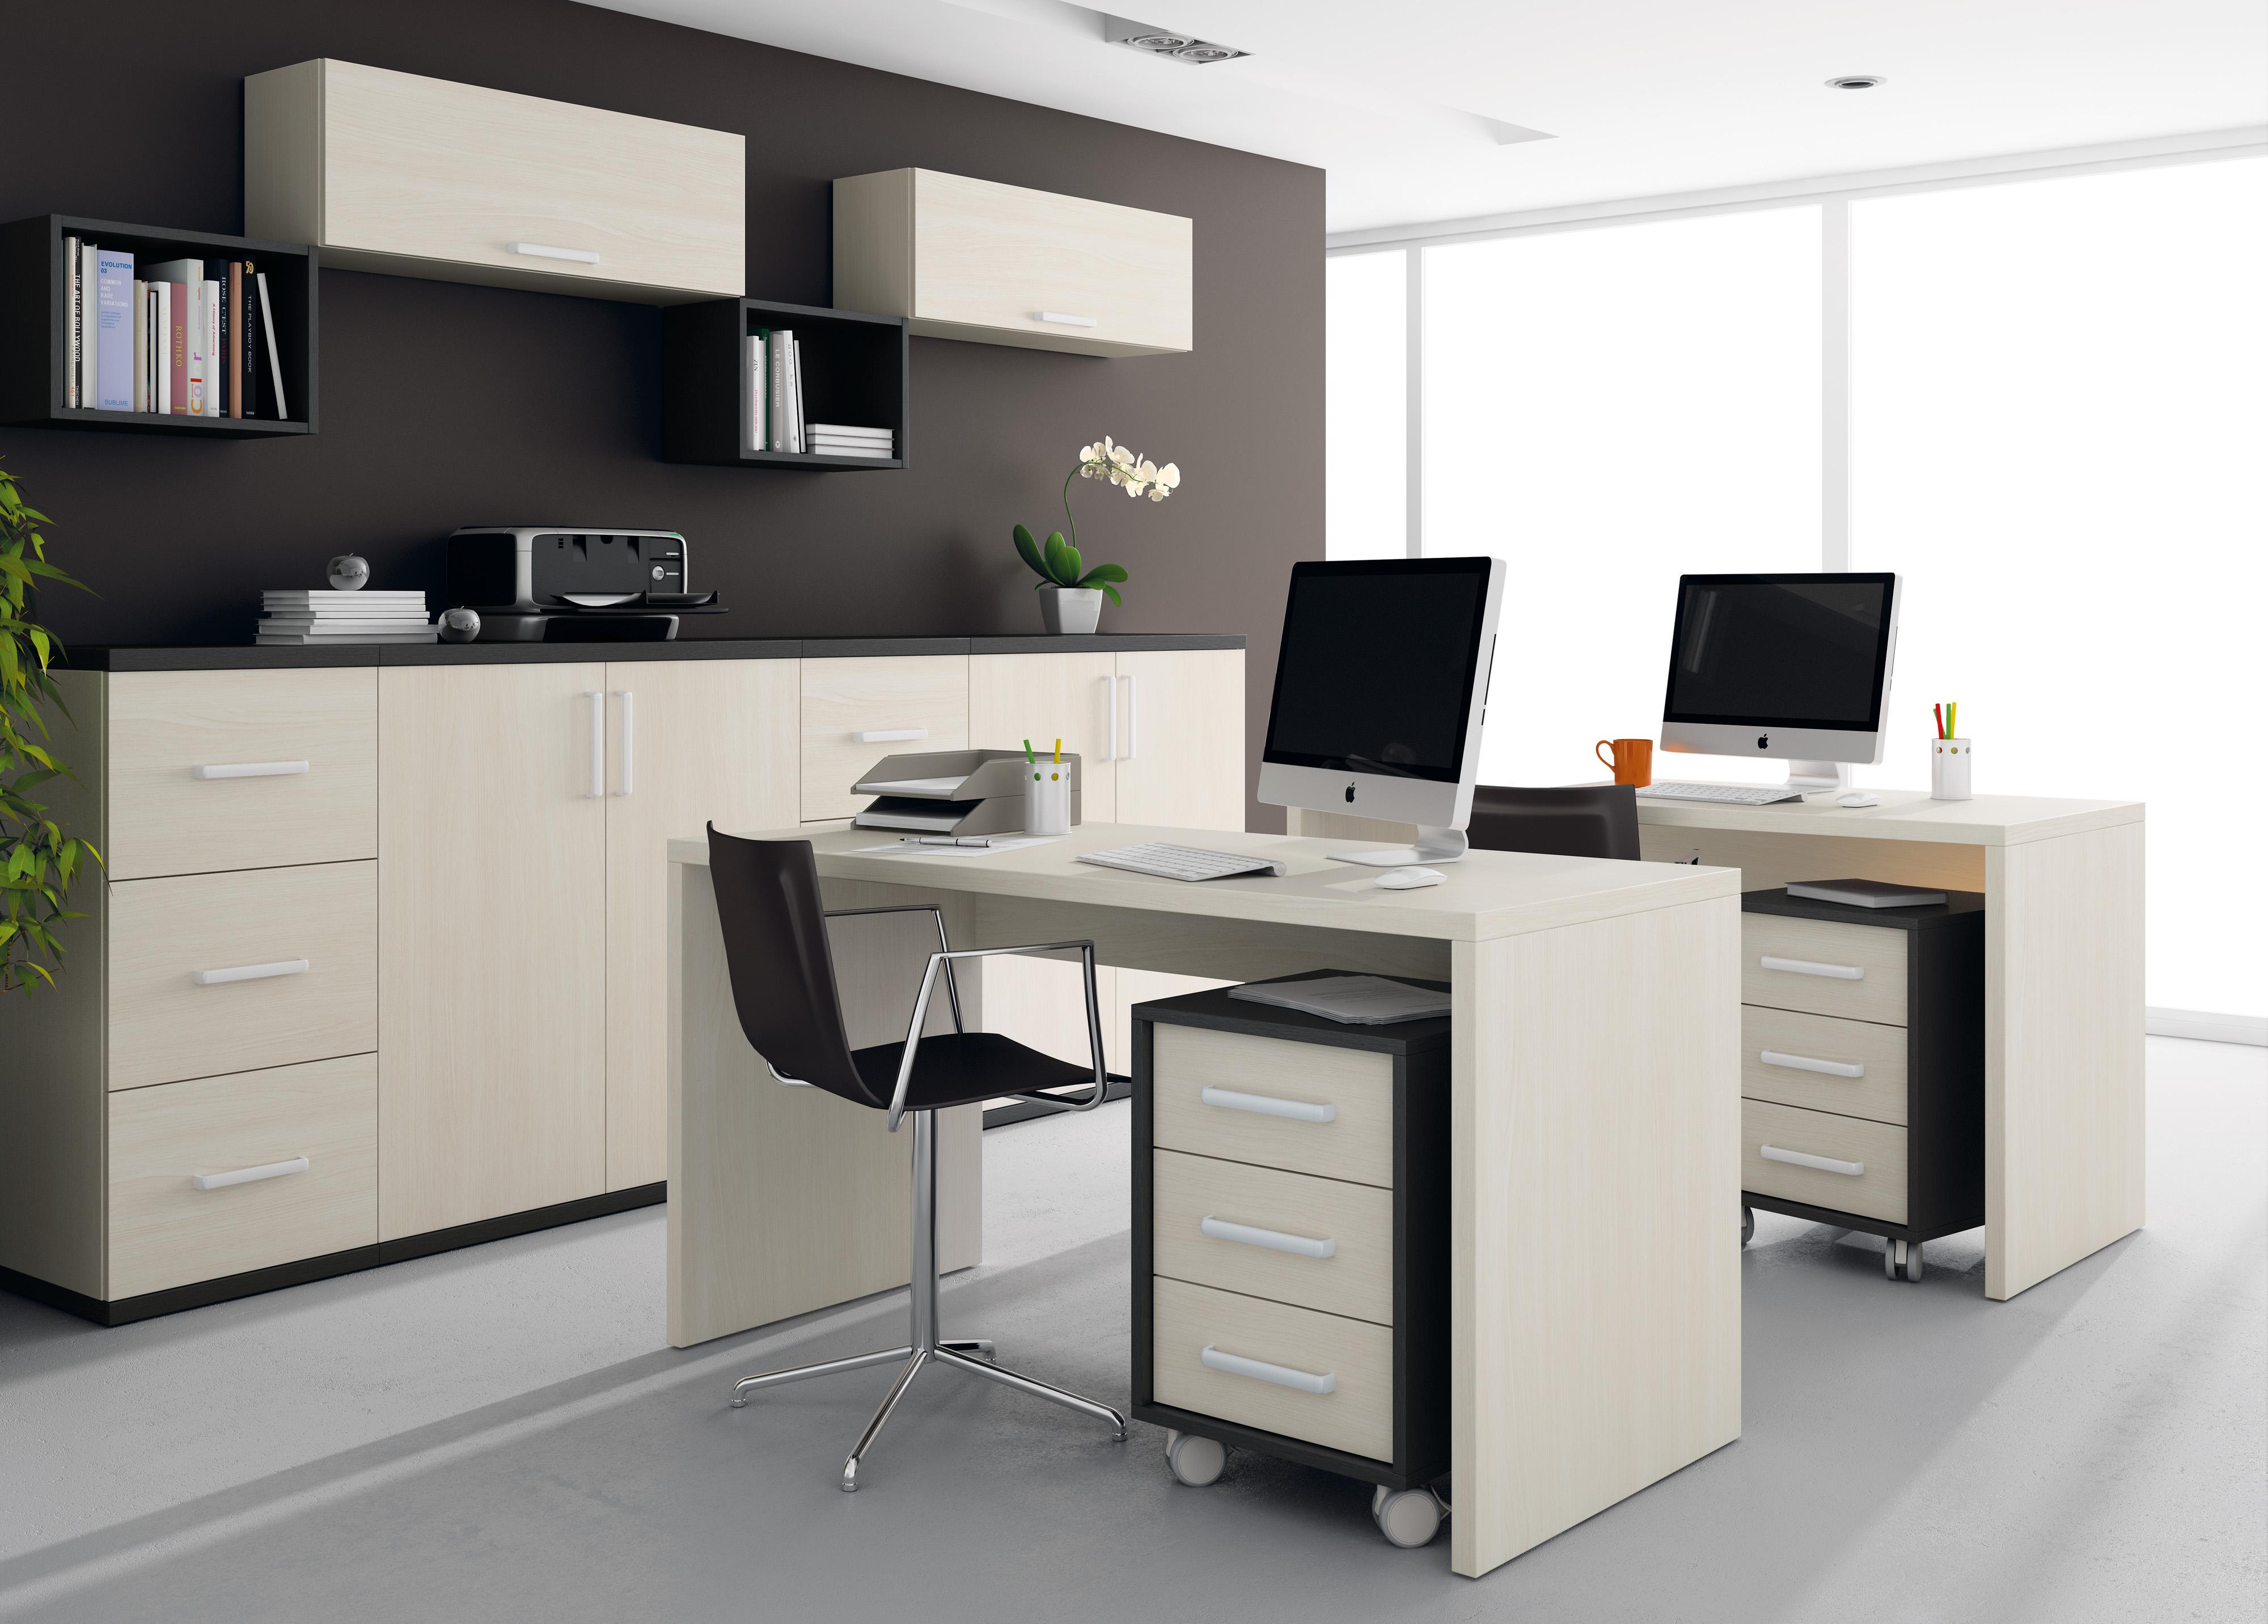 Gu a para elegir el dormitorio juvenil escritorios for Muebles modernos para oficinas pequenas